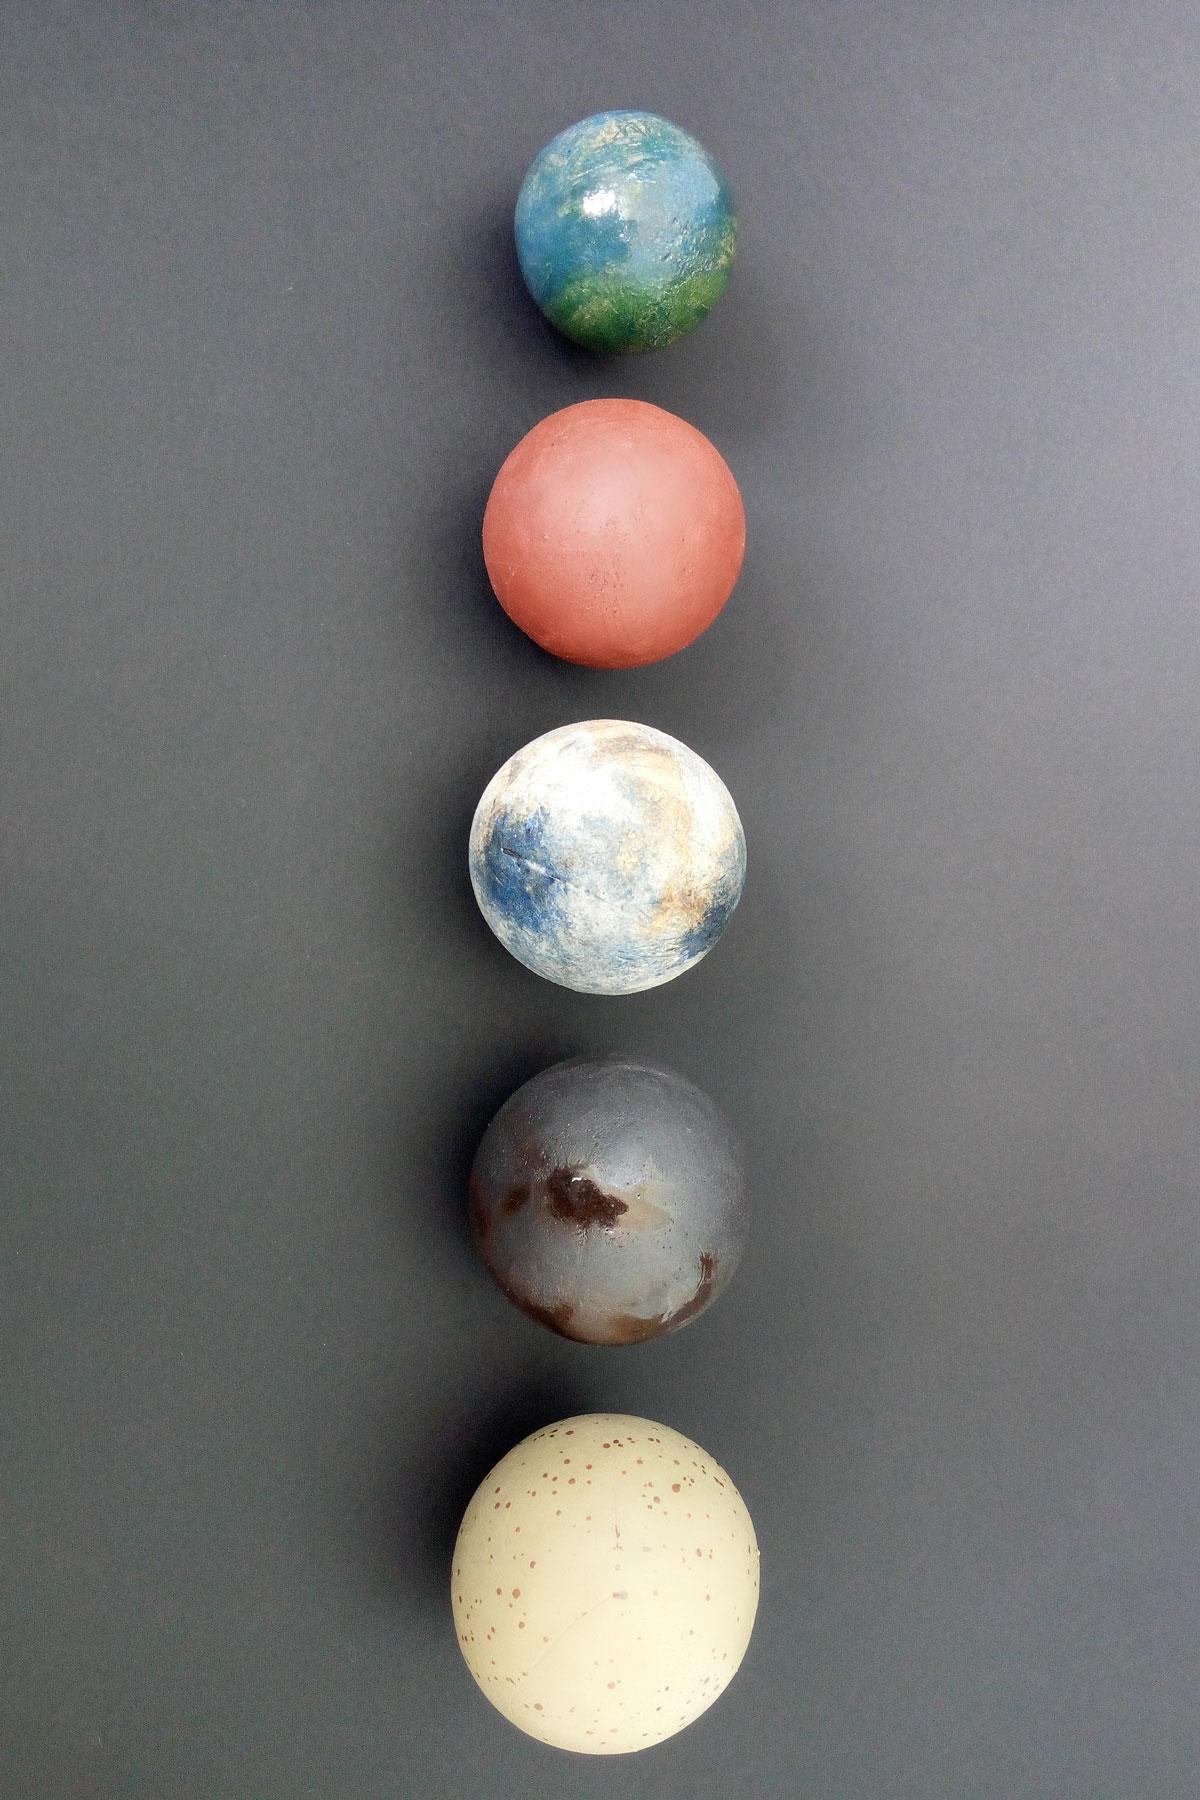 Planetes-13